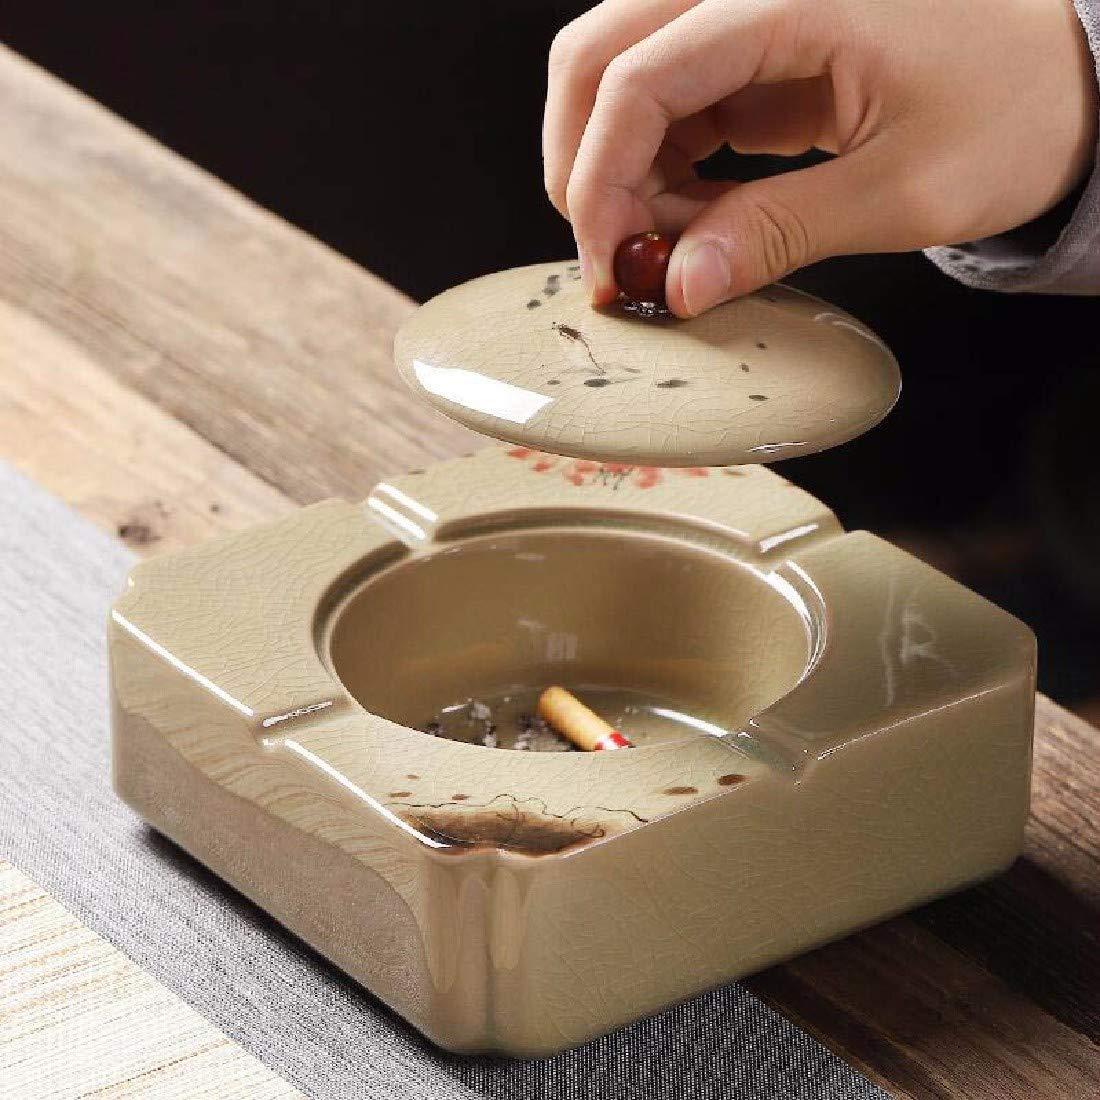 ZPSPZ cenicero Multifunction de cerámica Pintada a Tapa Mano cenicero con Tapa a para el hogar Oficina d419ae